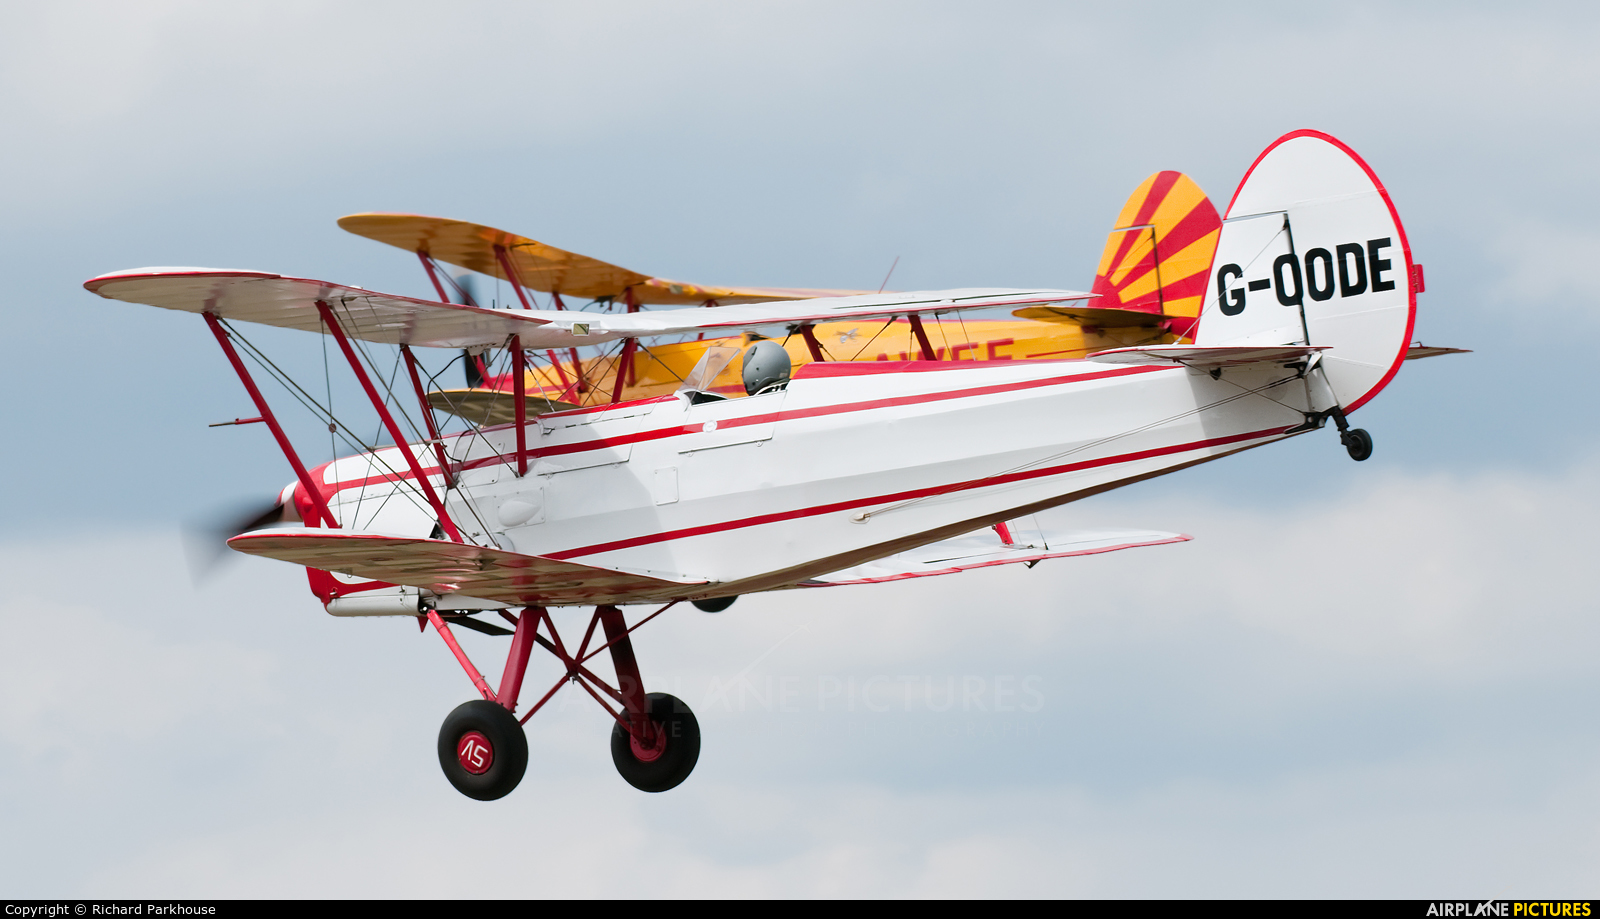 Private G-OODE aircraft at Lashenden / Headcorn